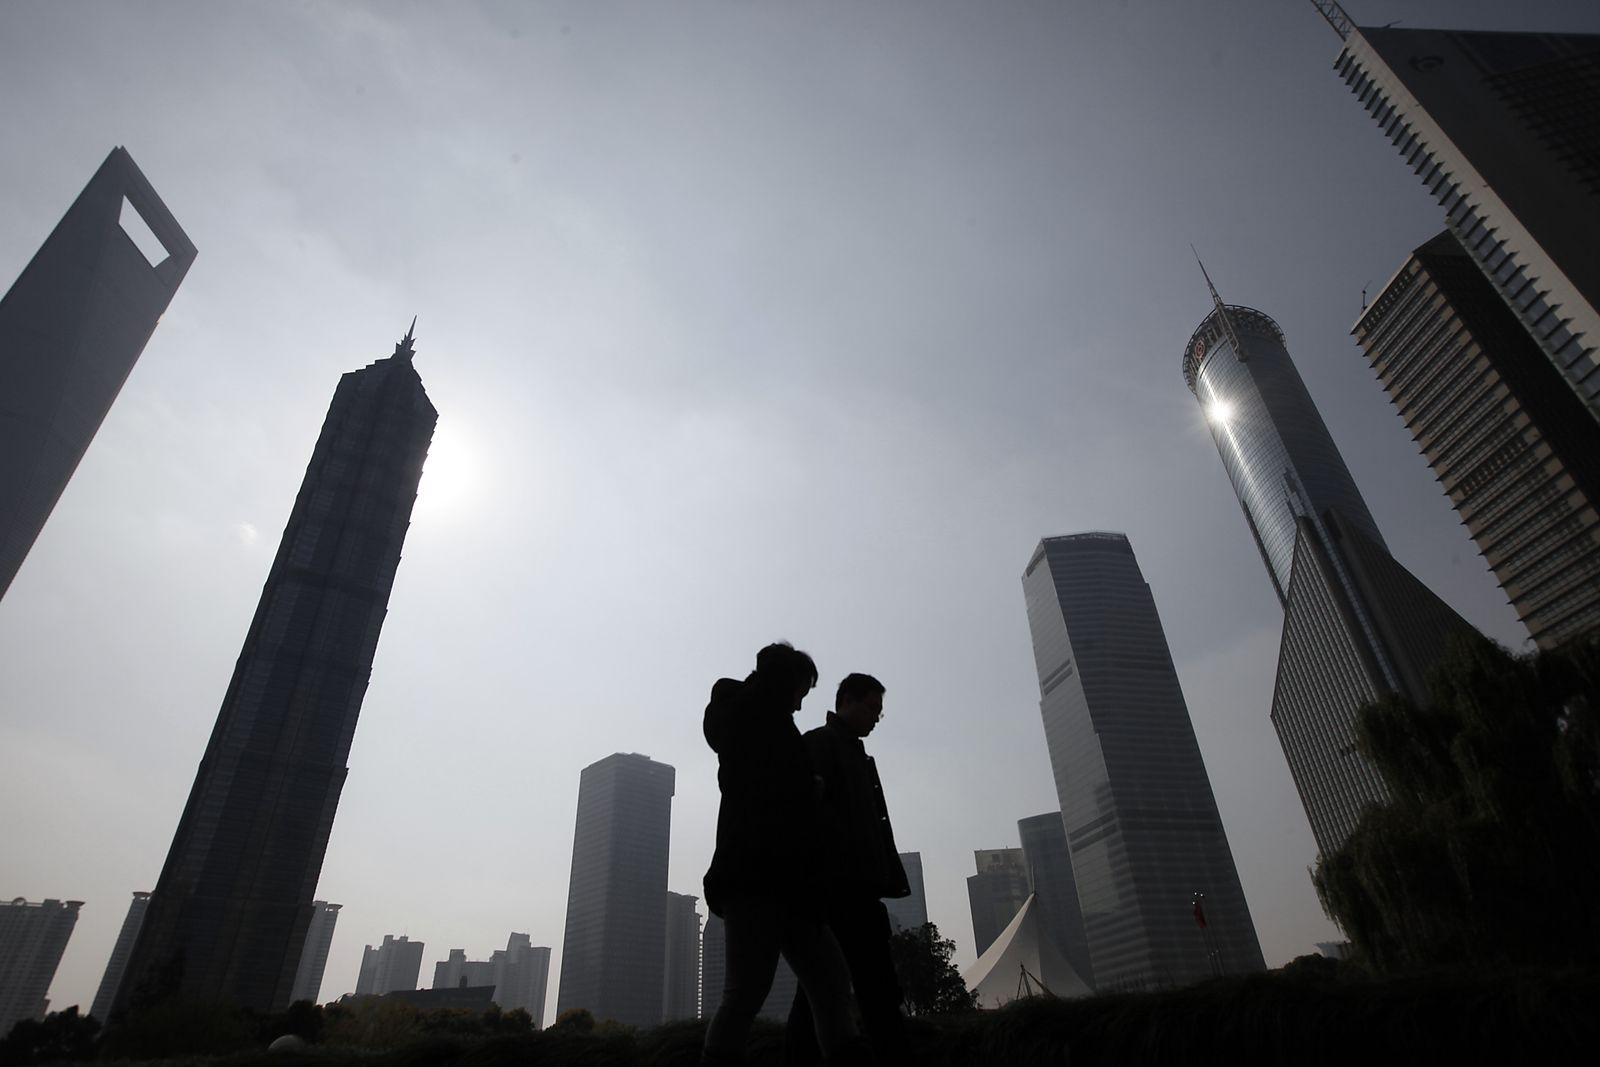 China / Schanghai / Pudong